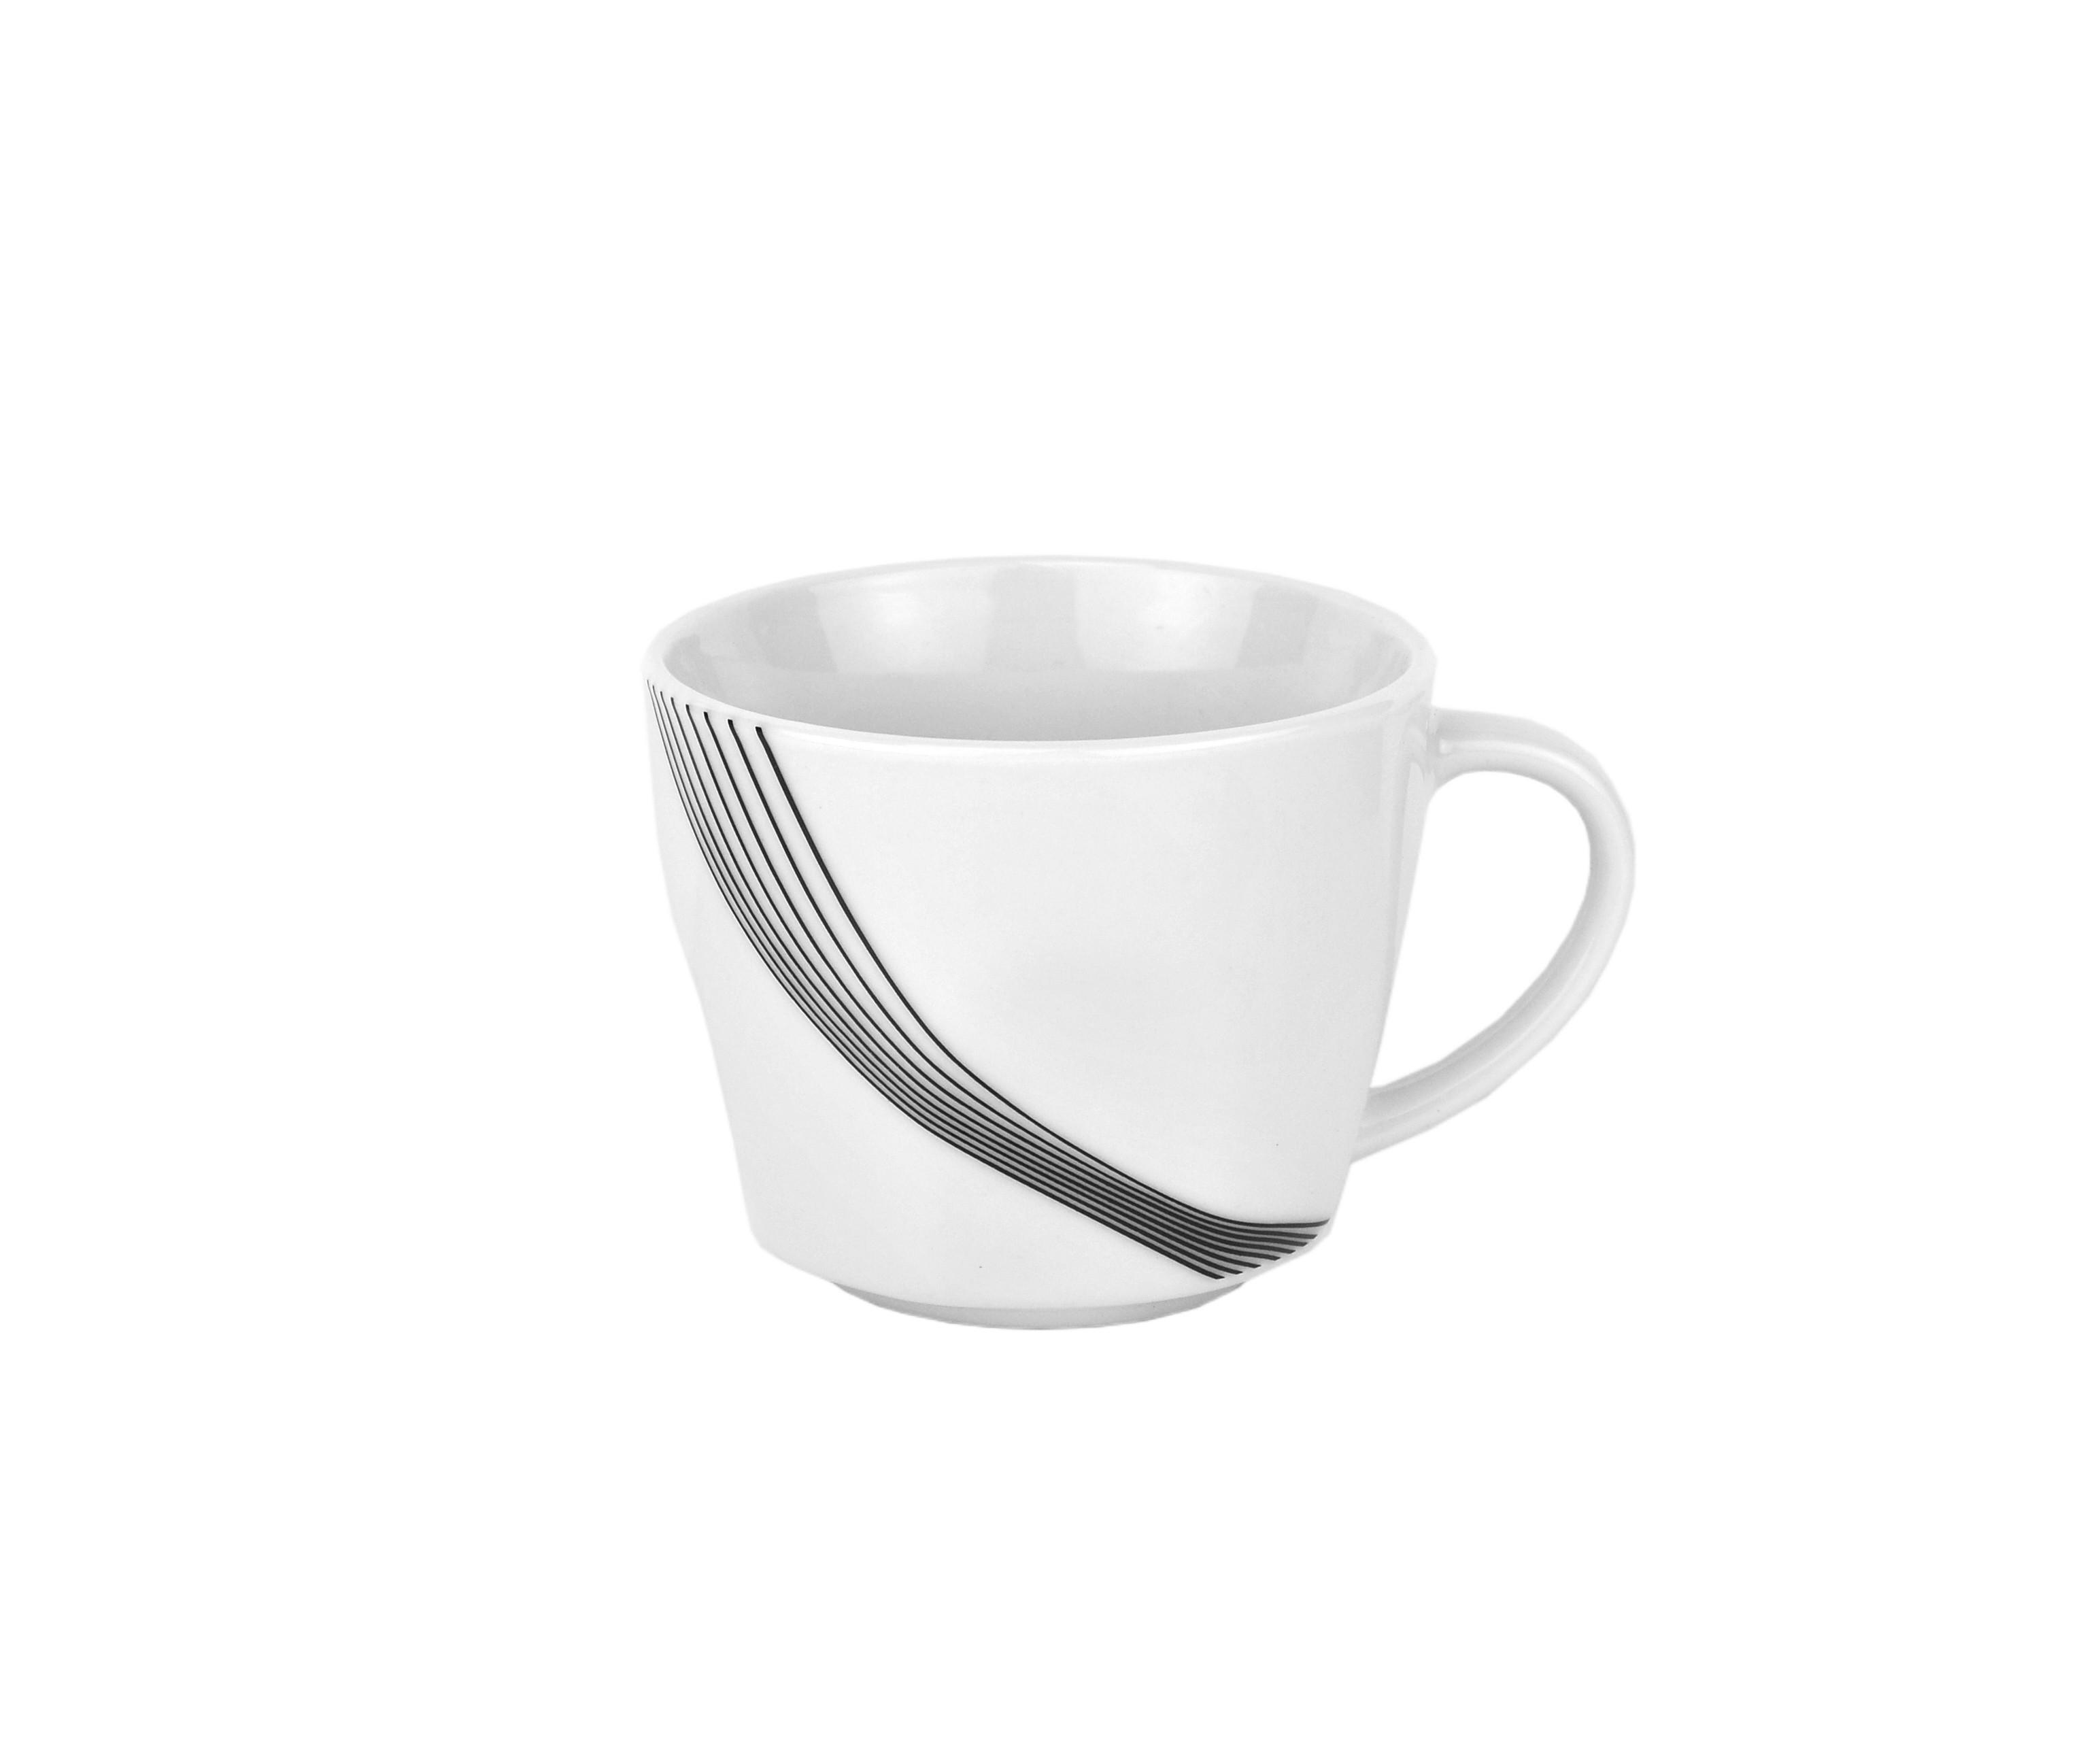 kaffeeservice 36 tlg impulse eckig porzellan 12 personen wei mit dekor tassen ebay. Black Bedroom Furniture Sets. Home Design Ideas